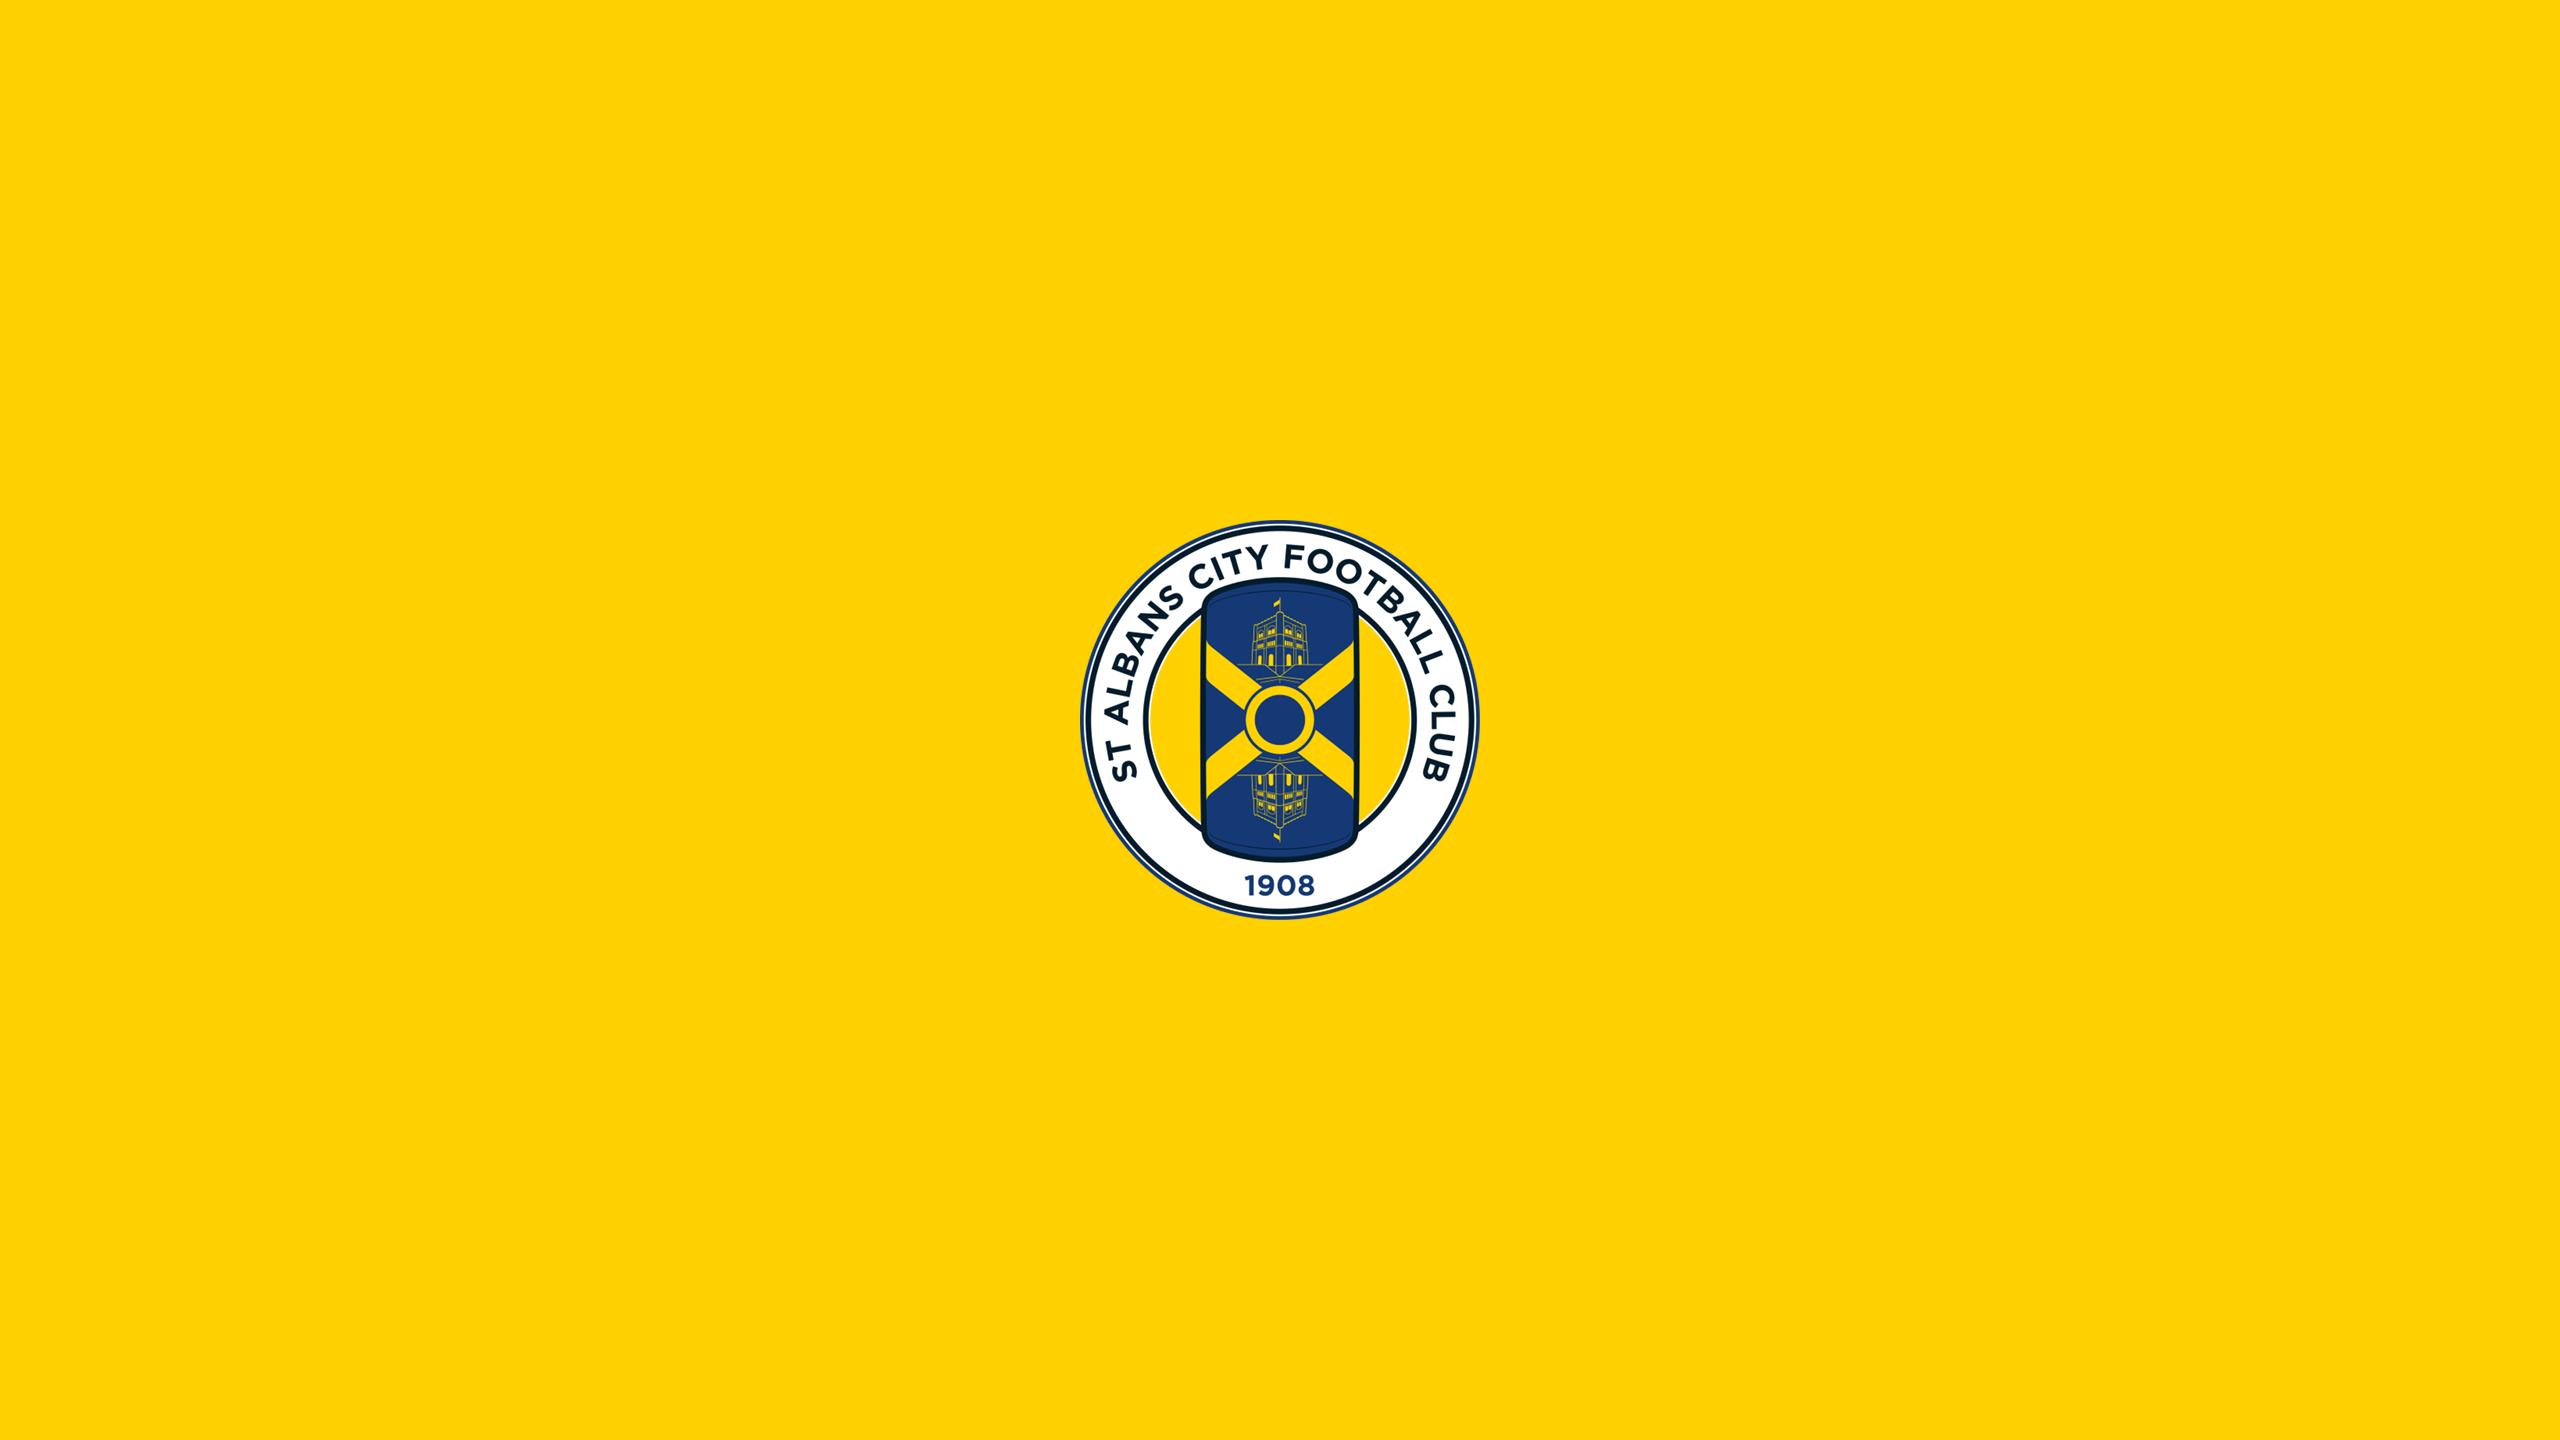 St. Albans City FC